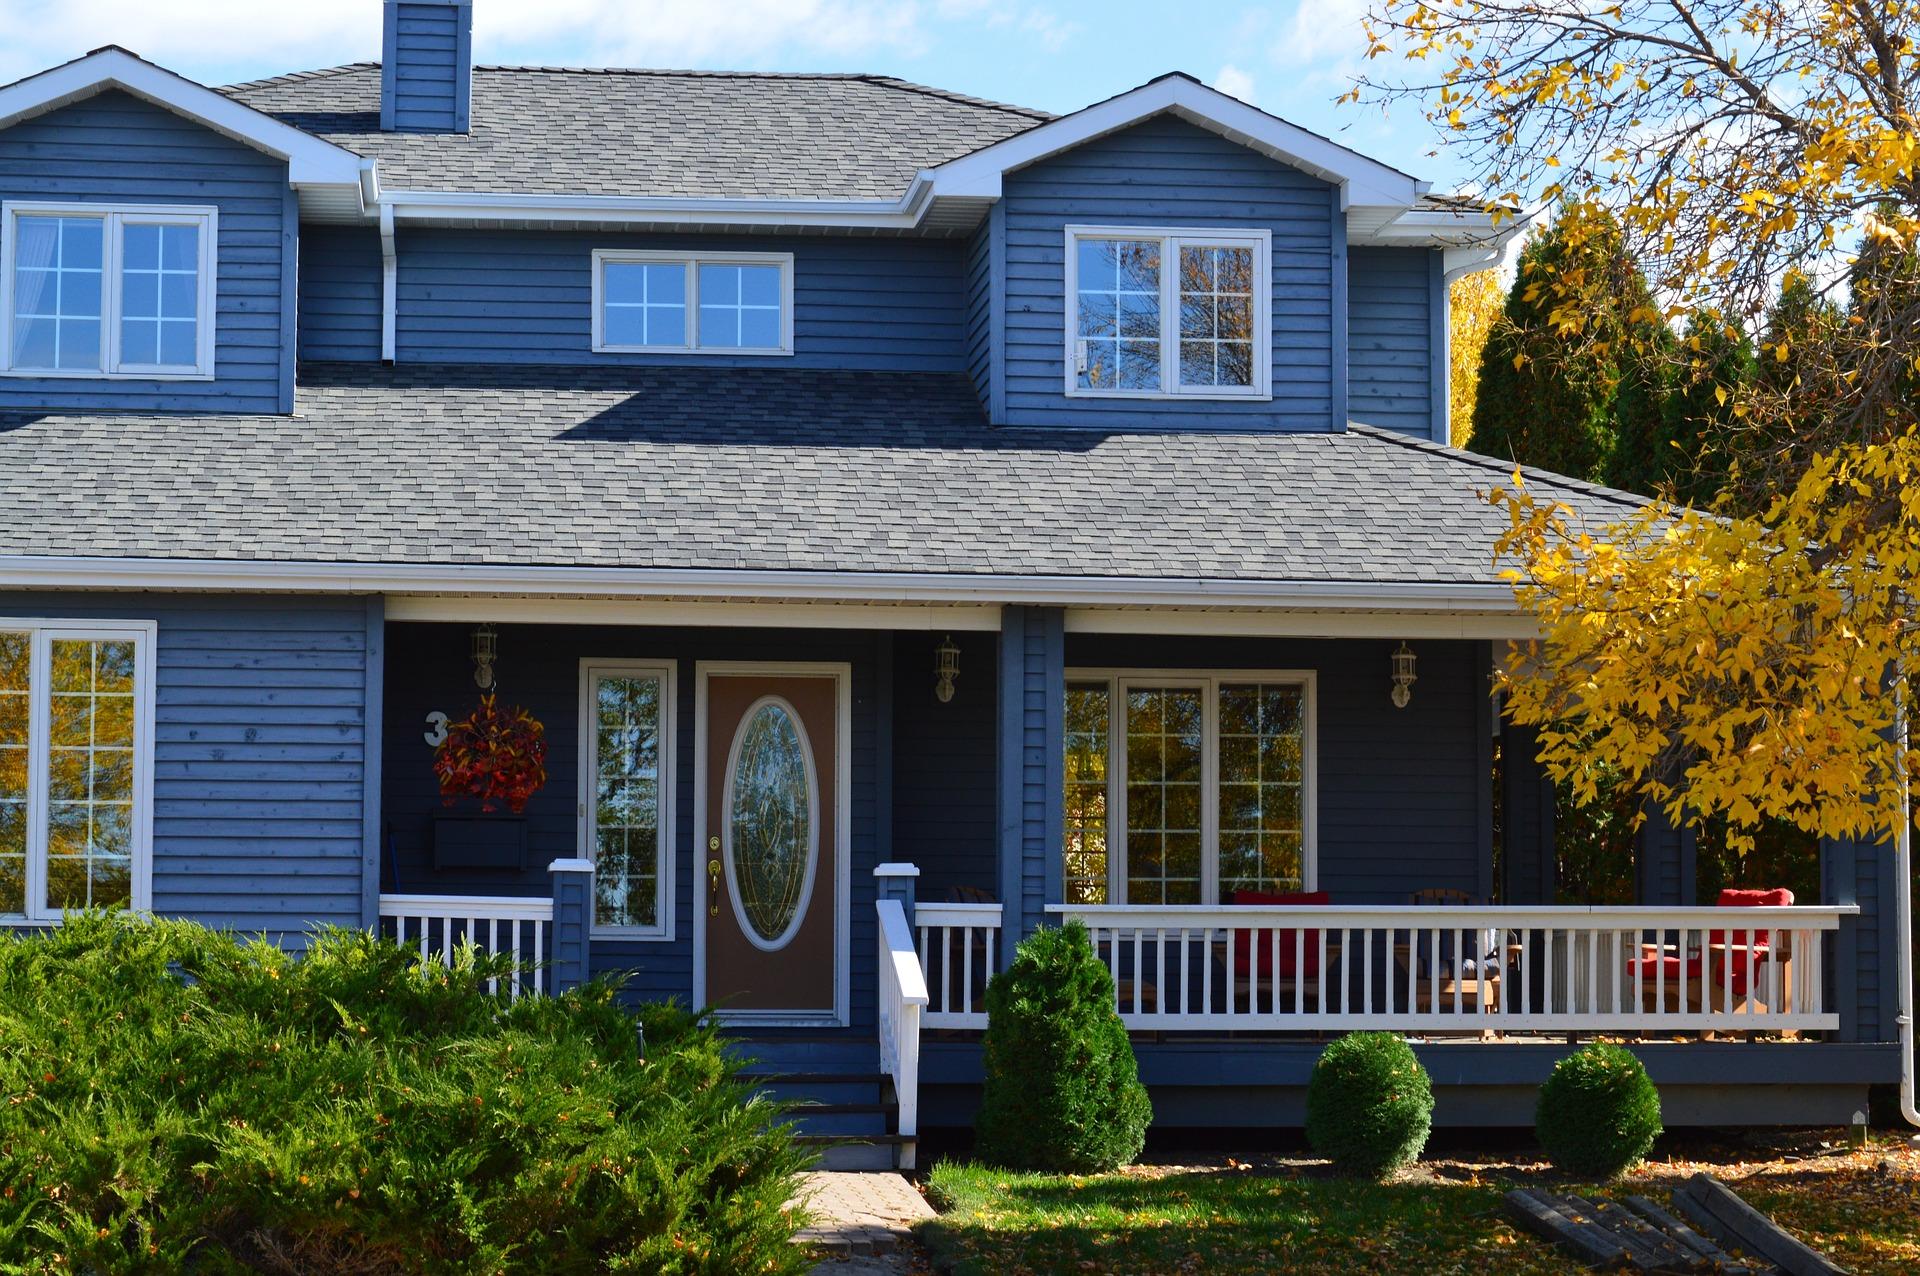 house-961401_1920